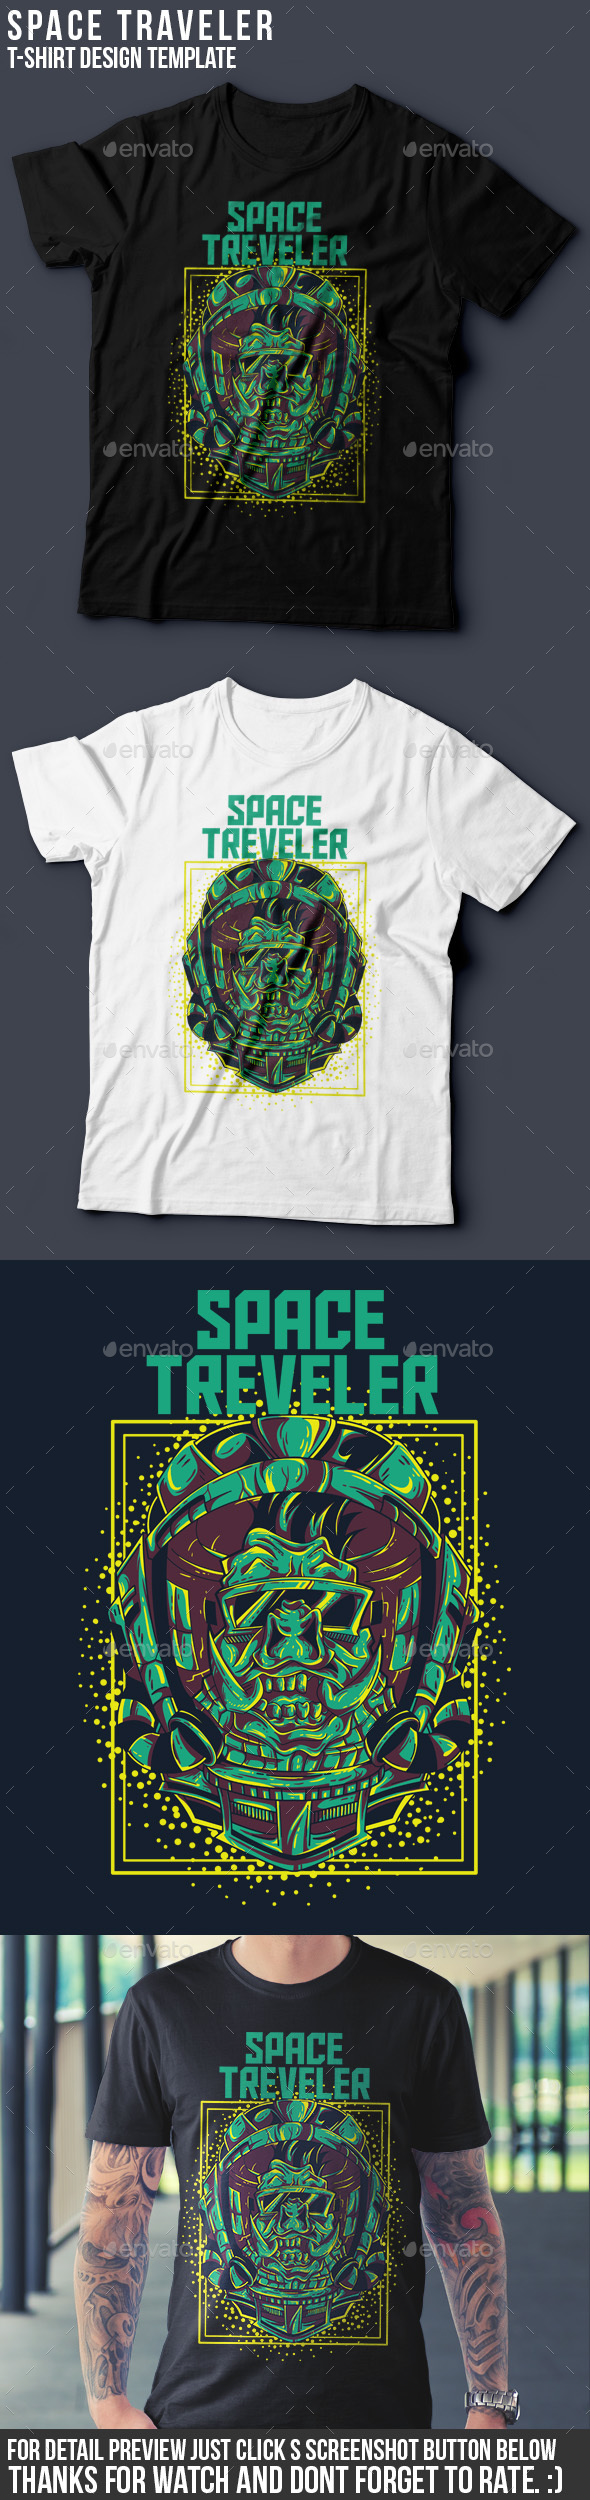 Space Traveler T-shirt Design